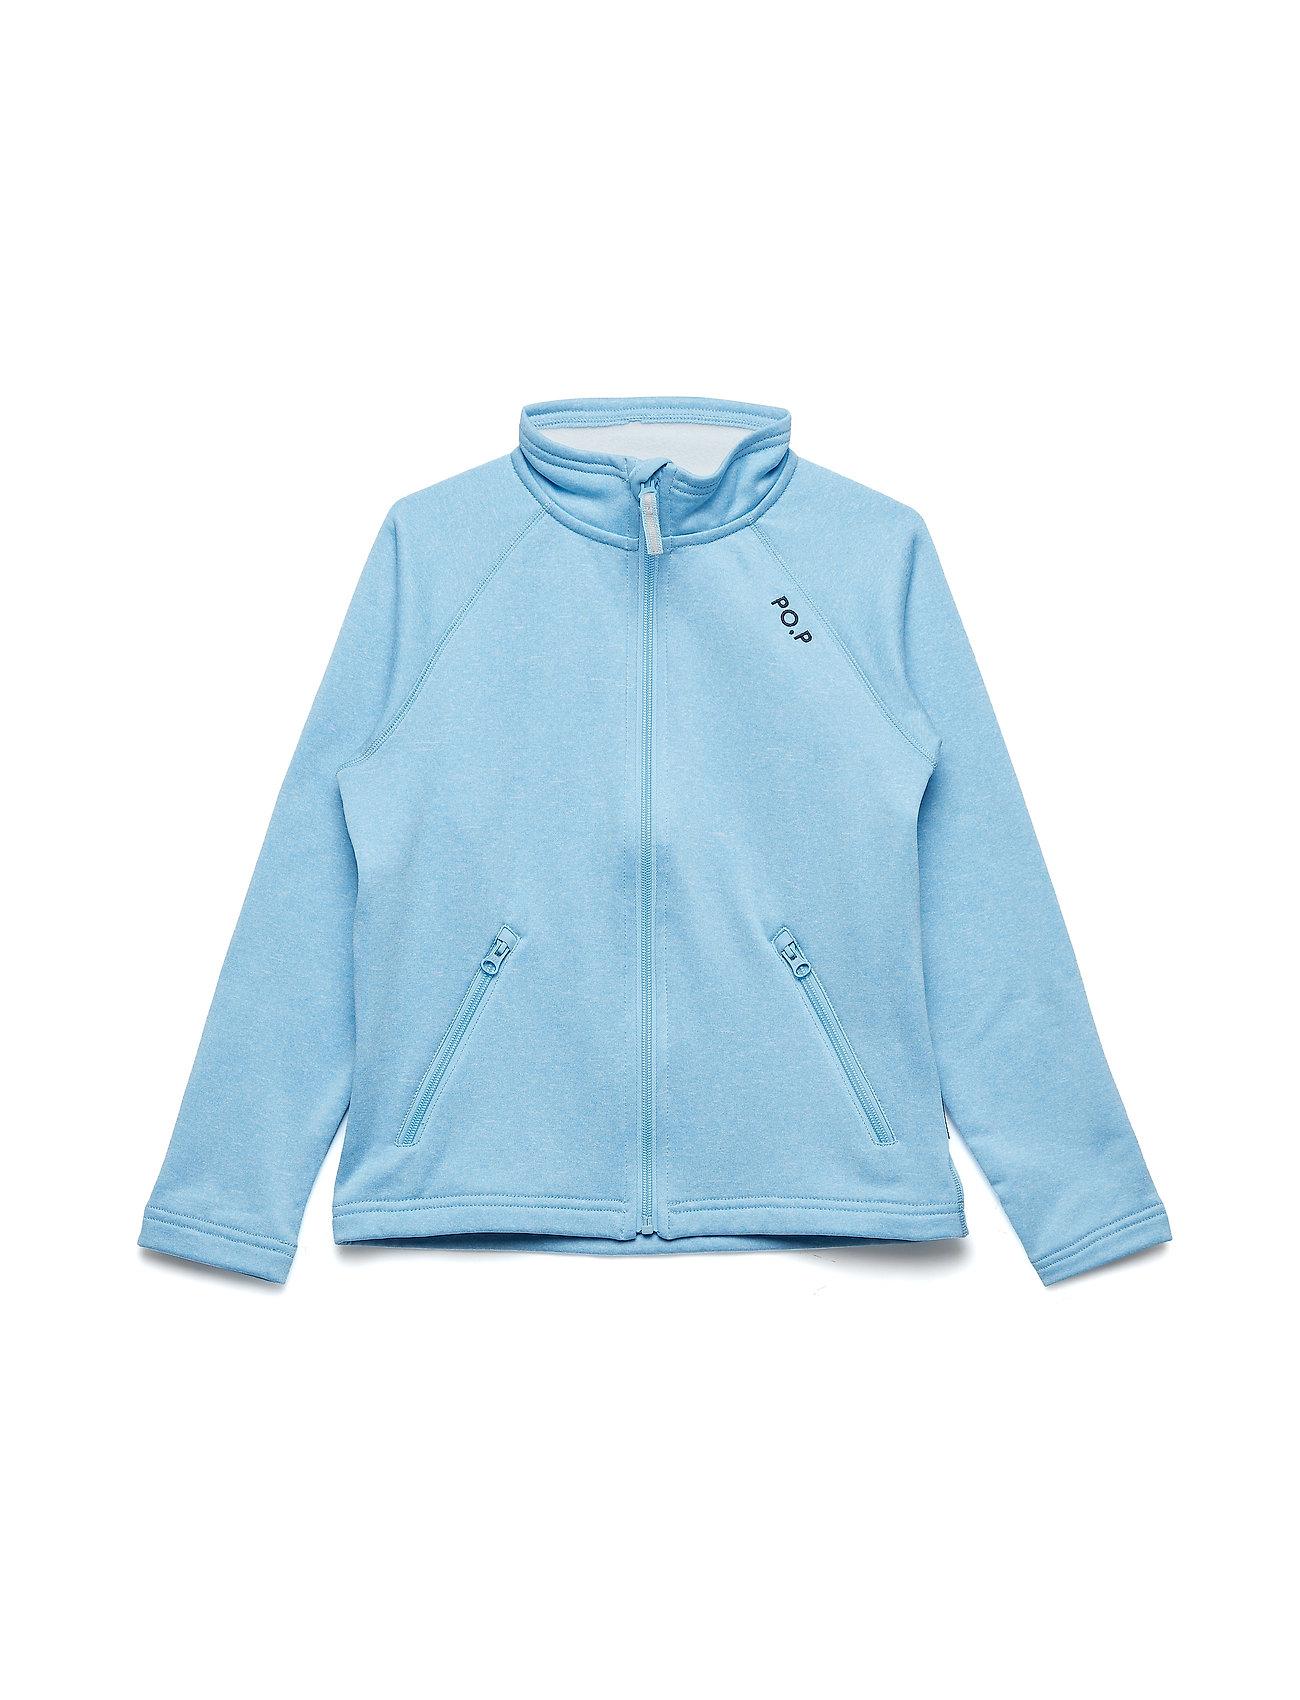 Polarn O. Pyret Stretch Fleece Jacket